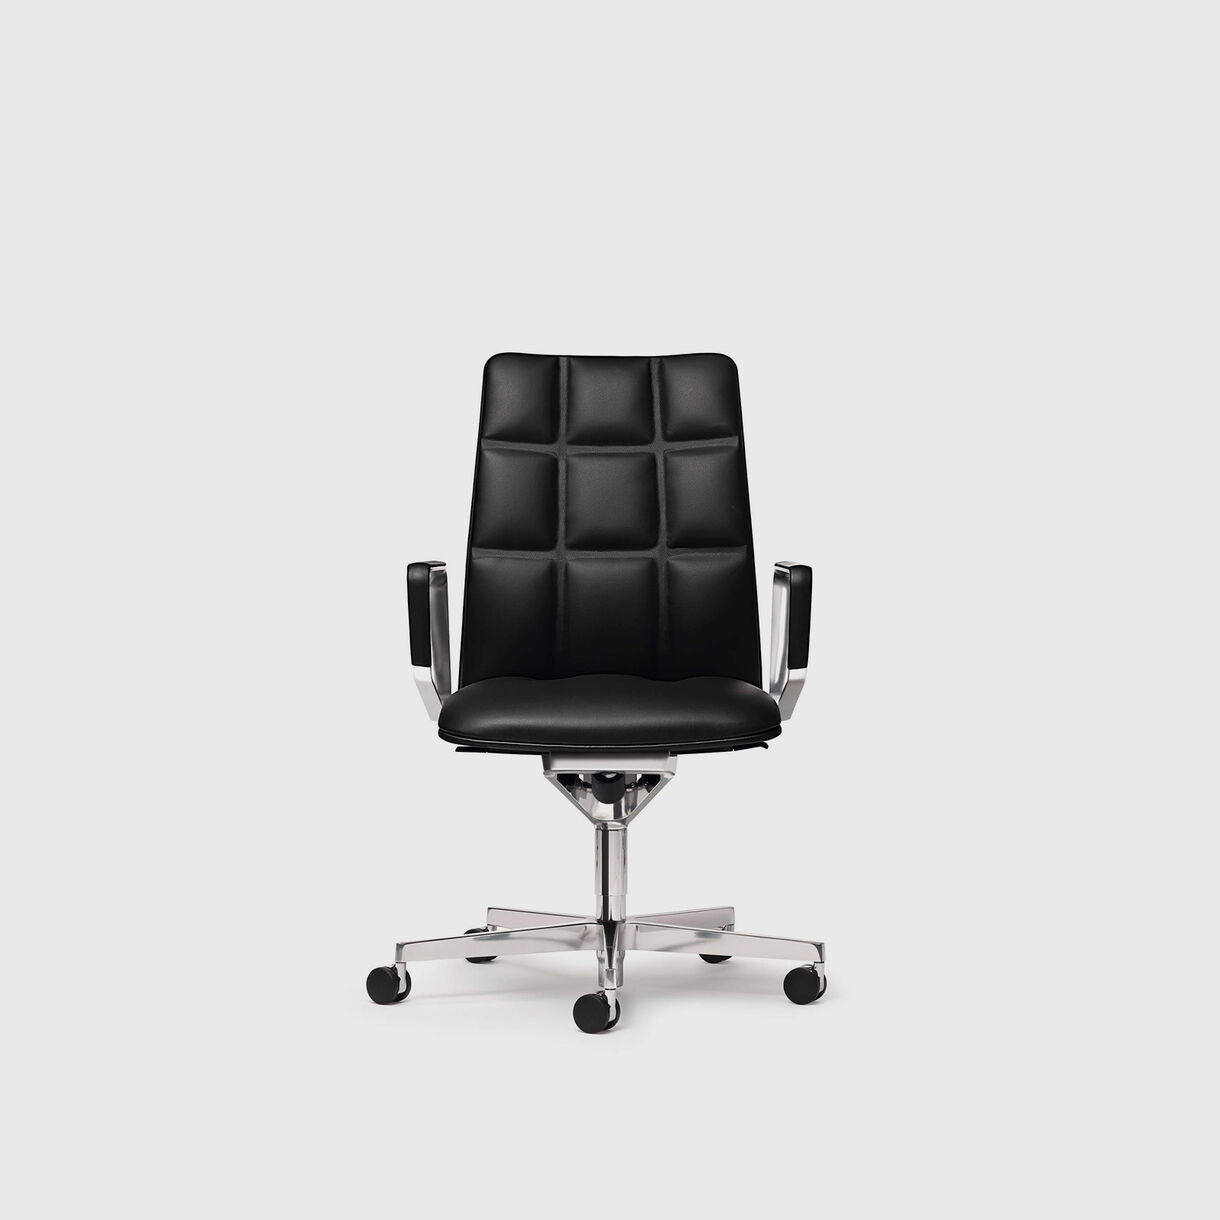 Leadchair Executive, Mid Back, Black